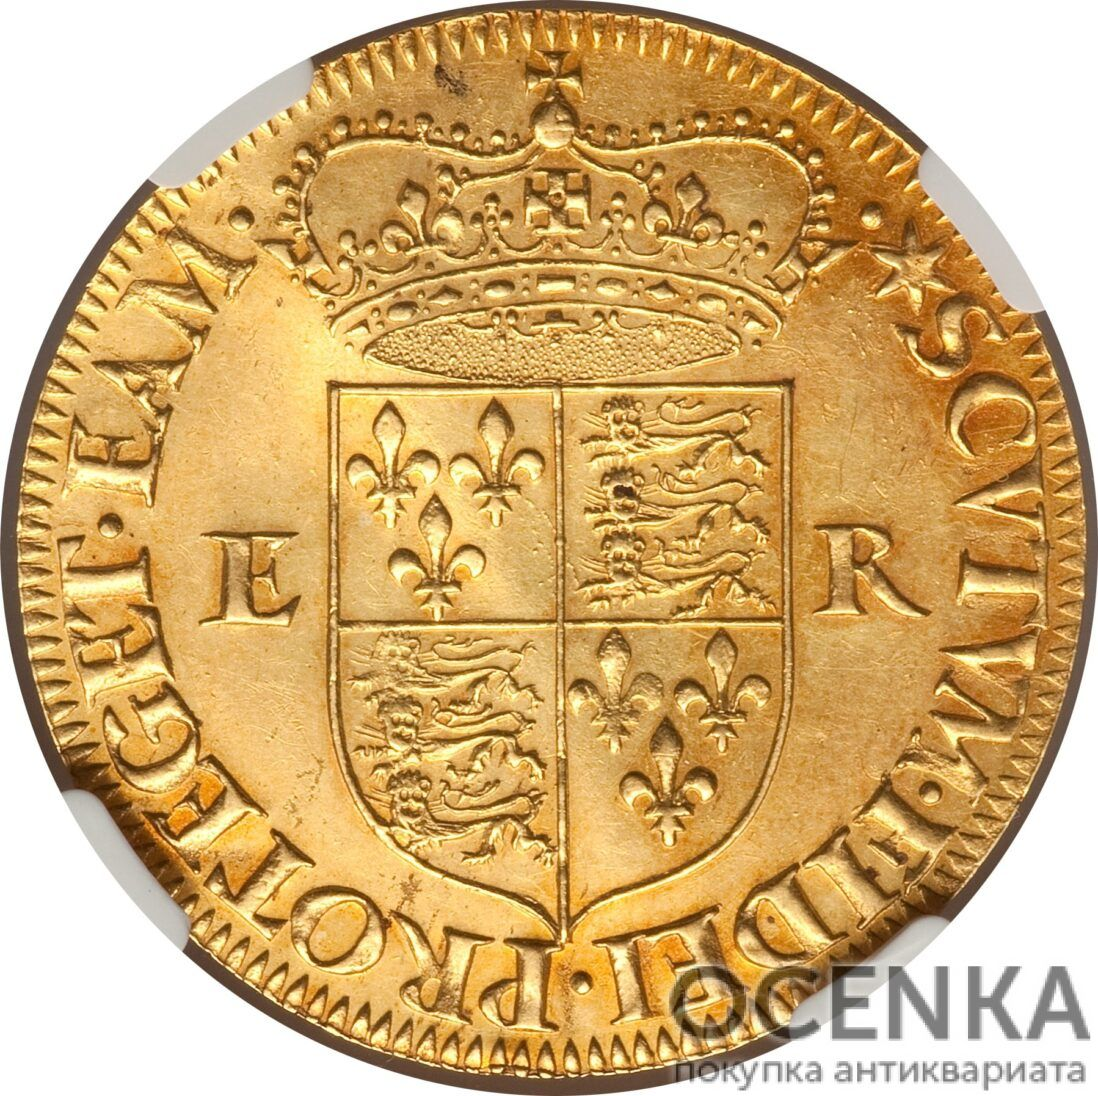 Золотая монета ½ Pound (полфунта) Великобритания - 1